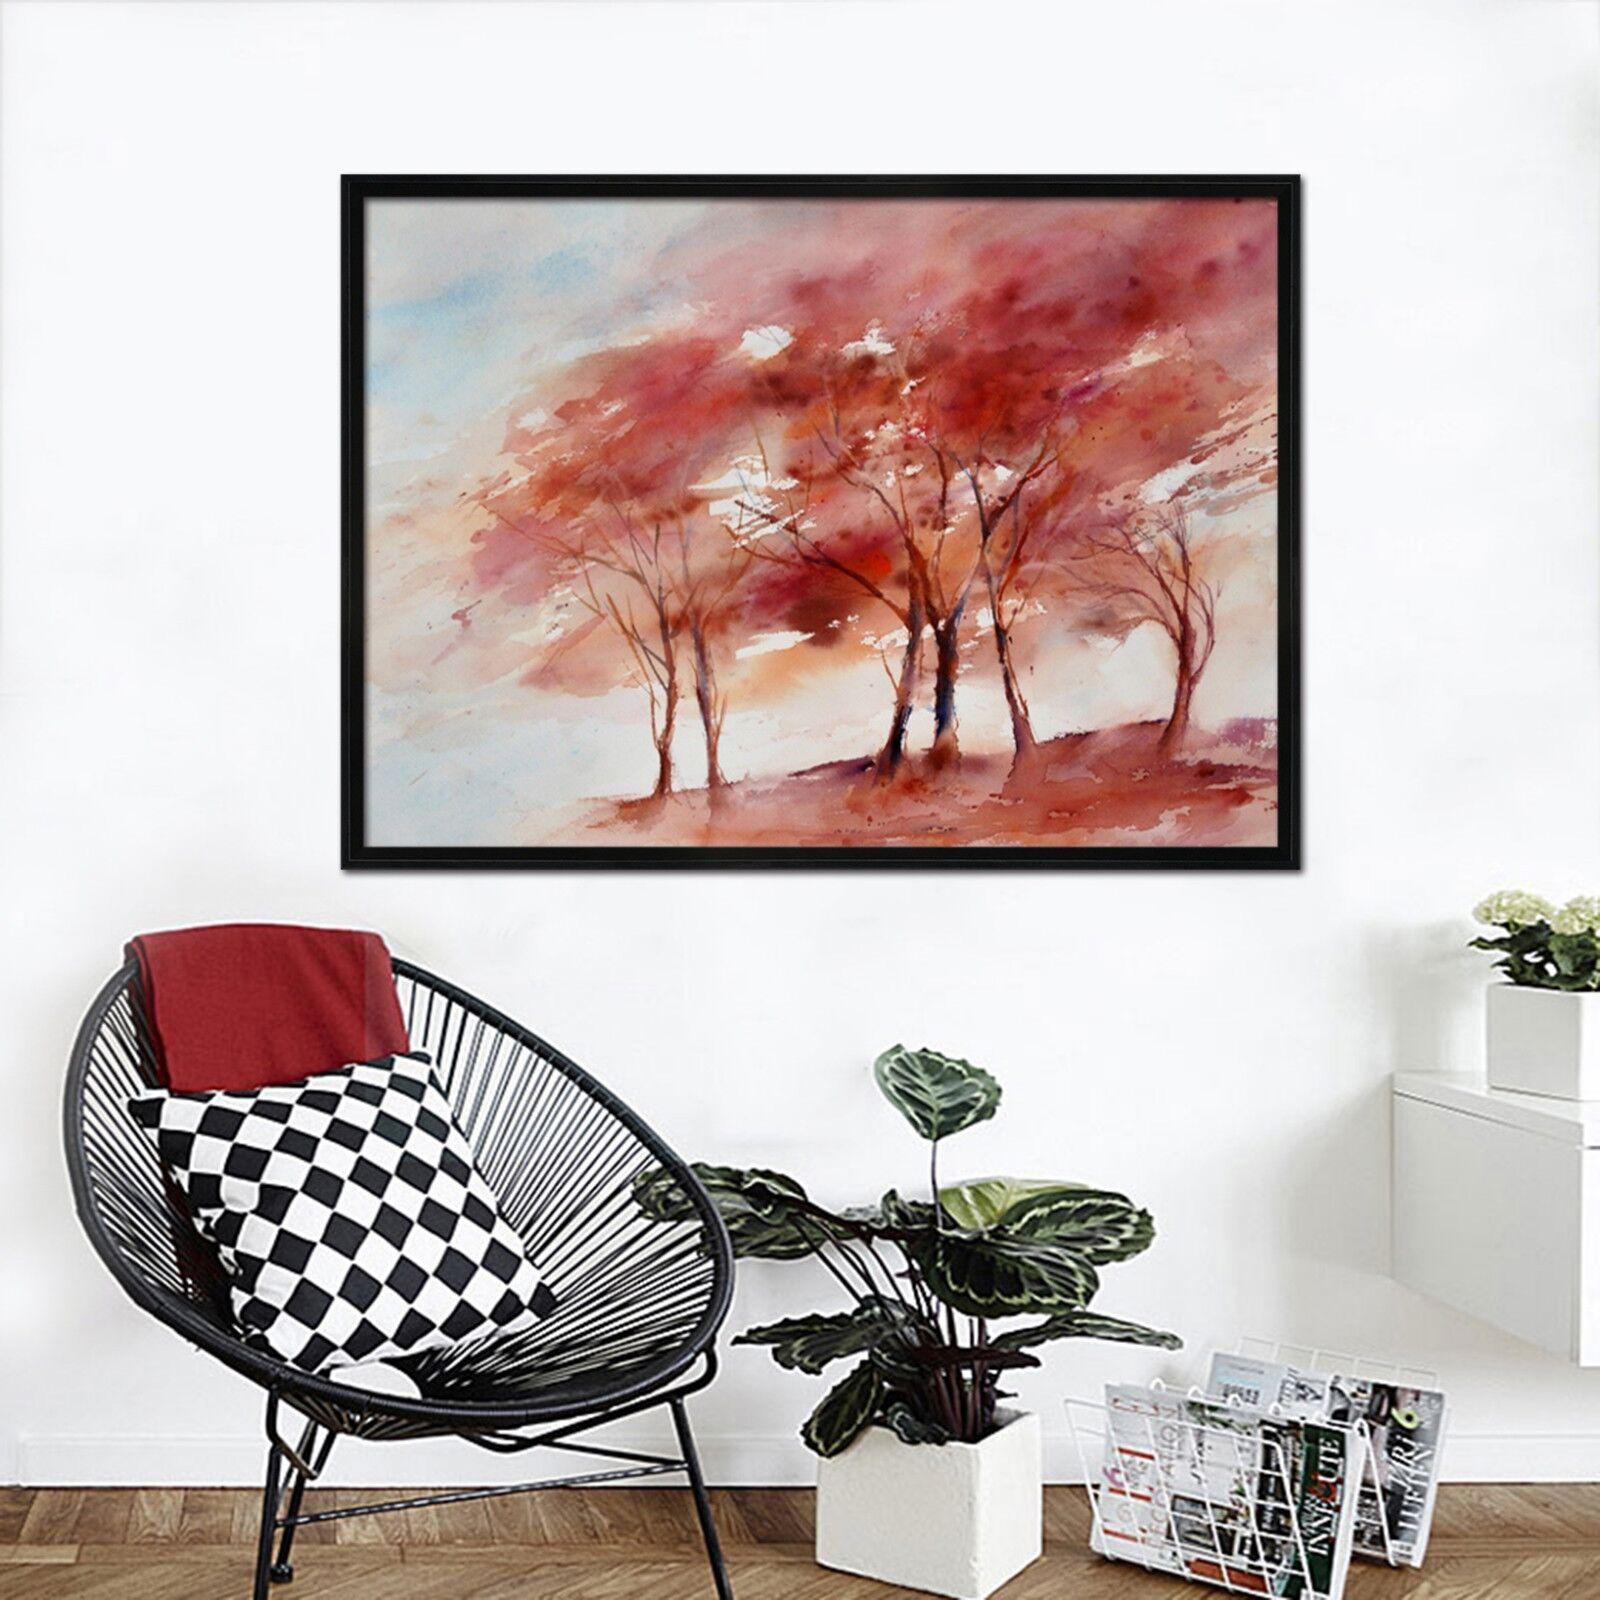 3D Painting Mangrove 55 Framed Poster Home Decor Print Painting Art AJ WALLPAPER